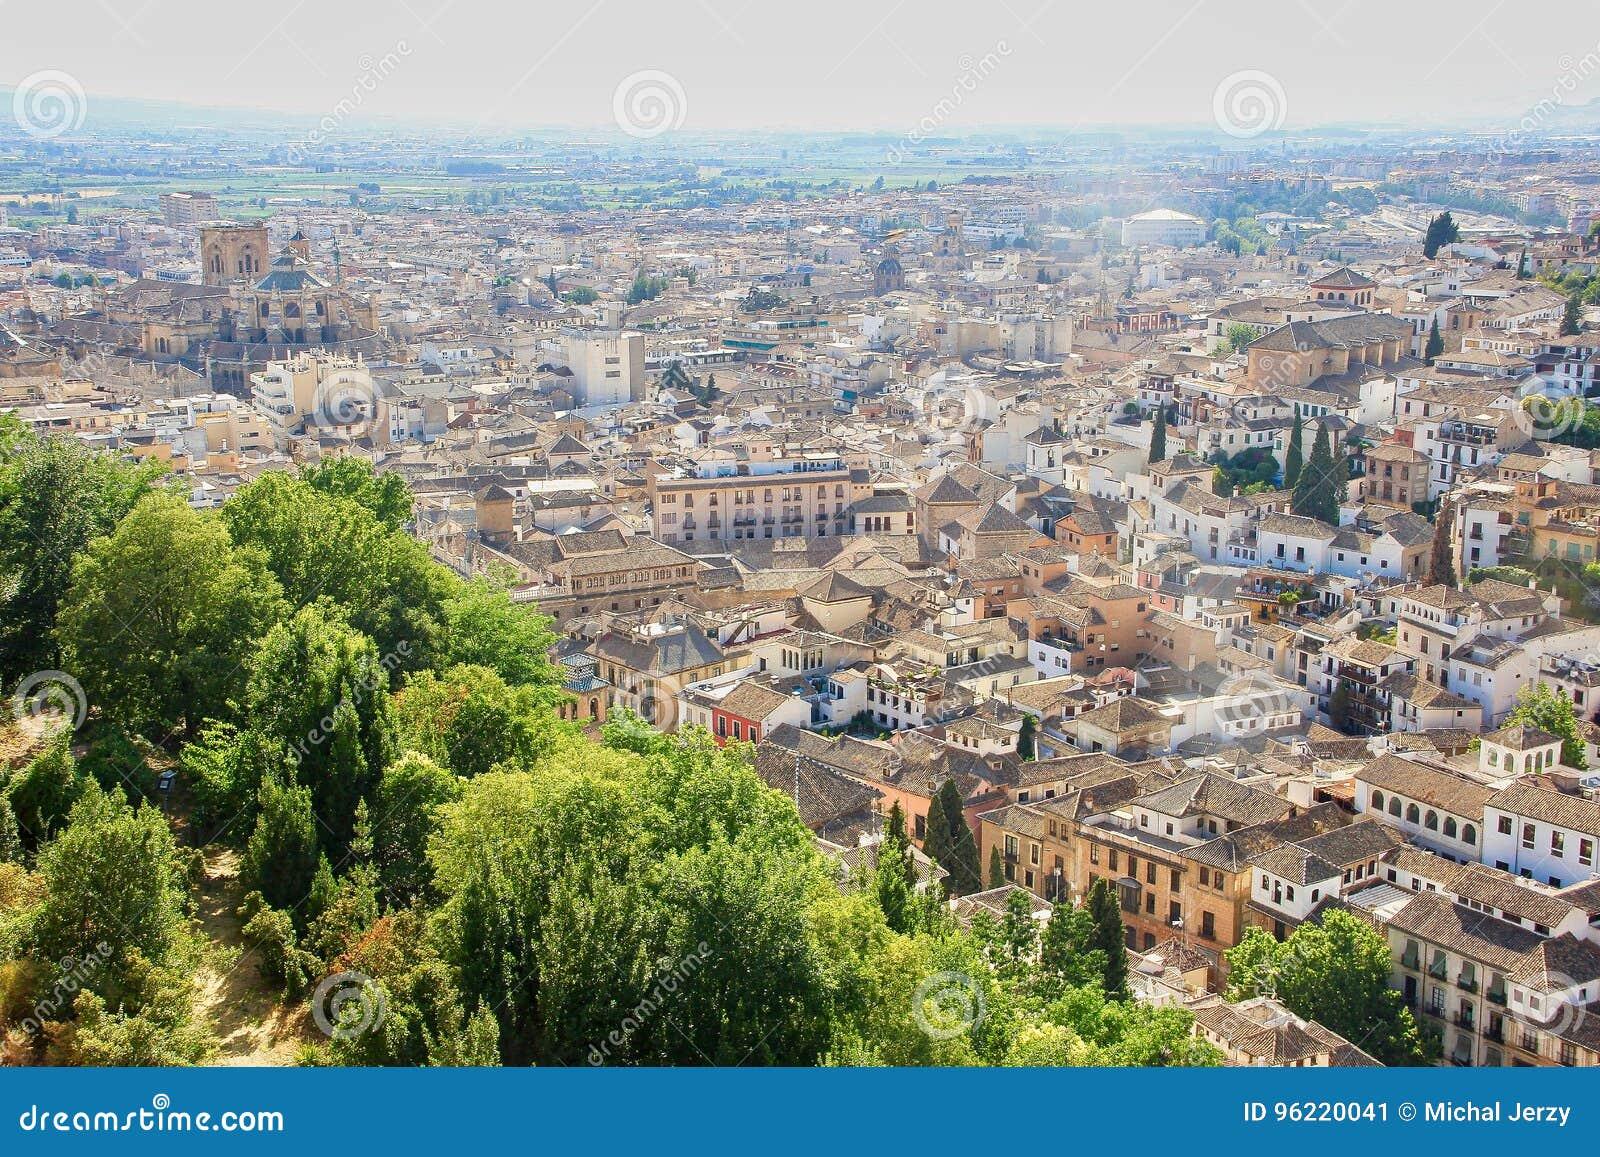 The city of Granada in Spain